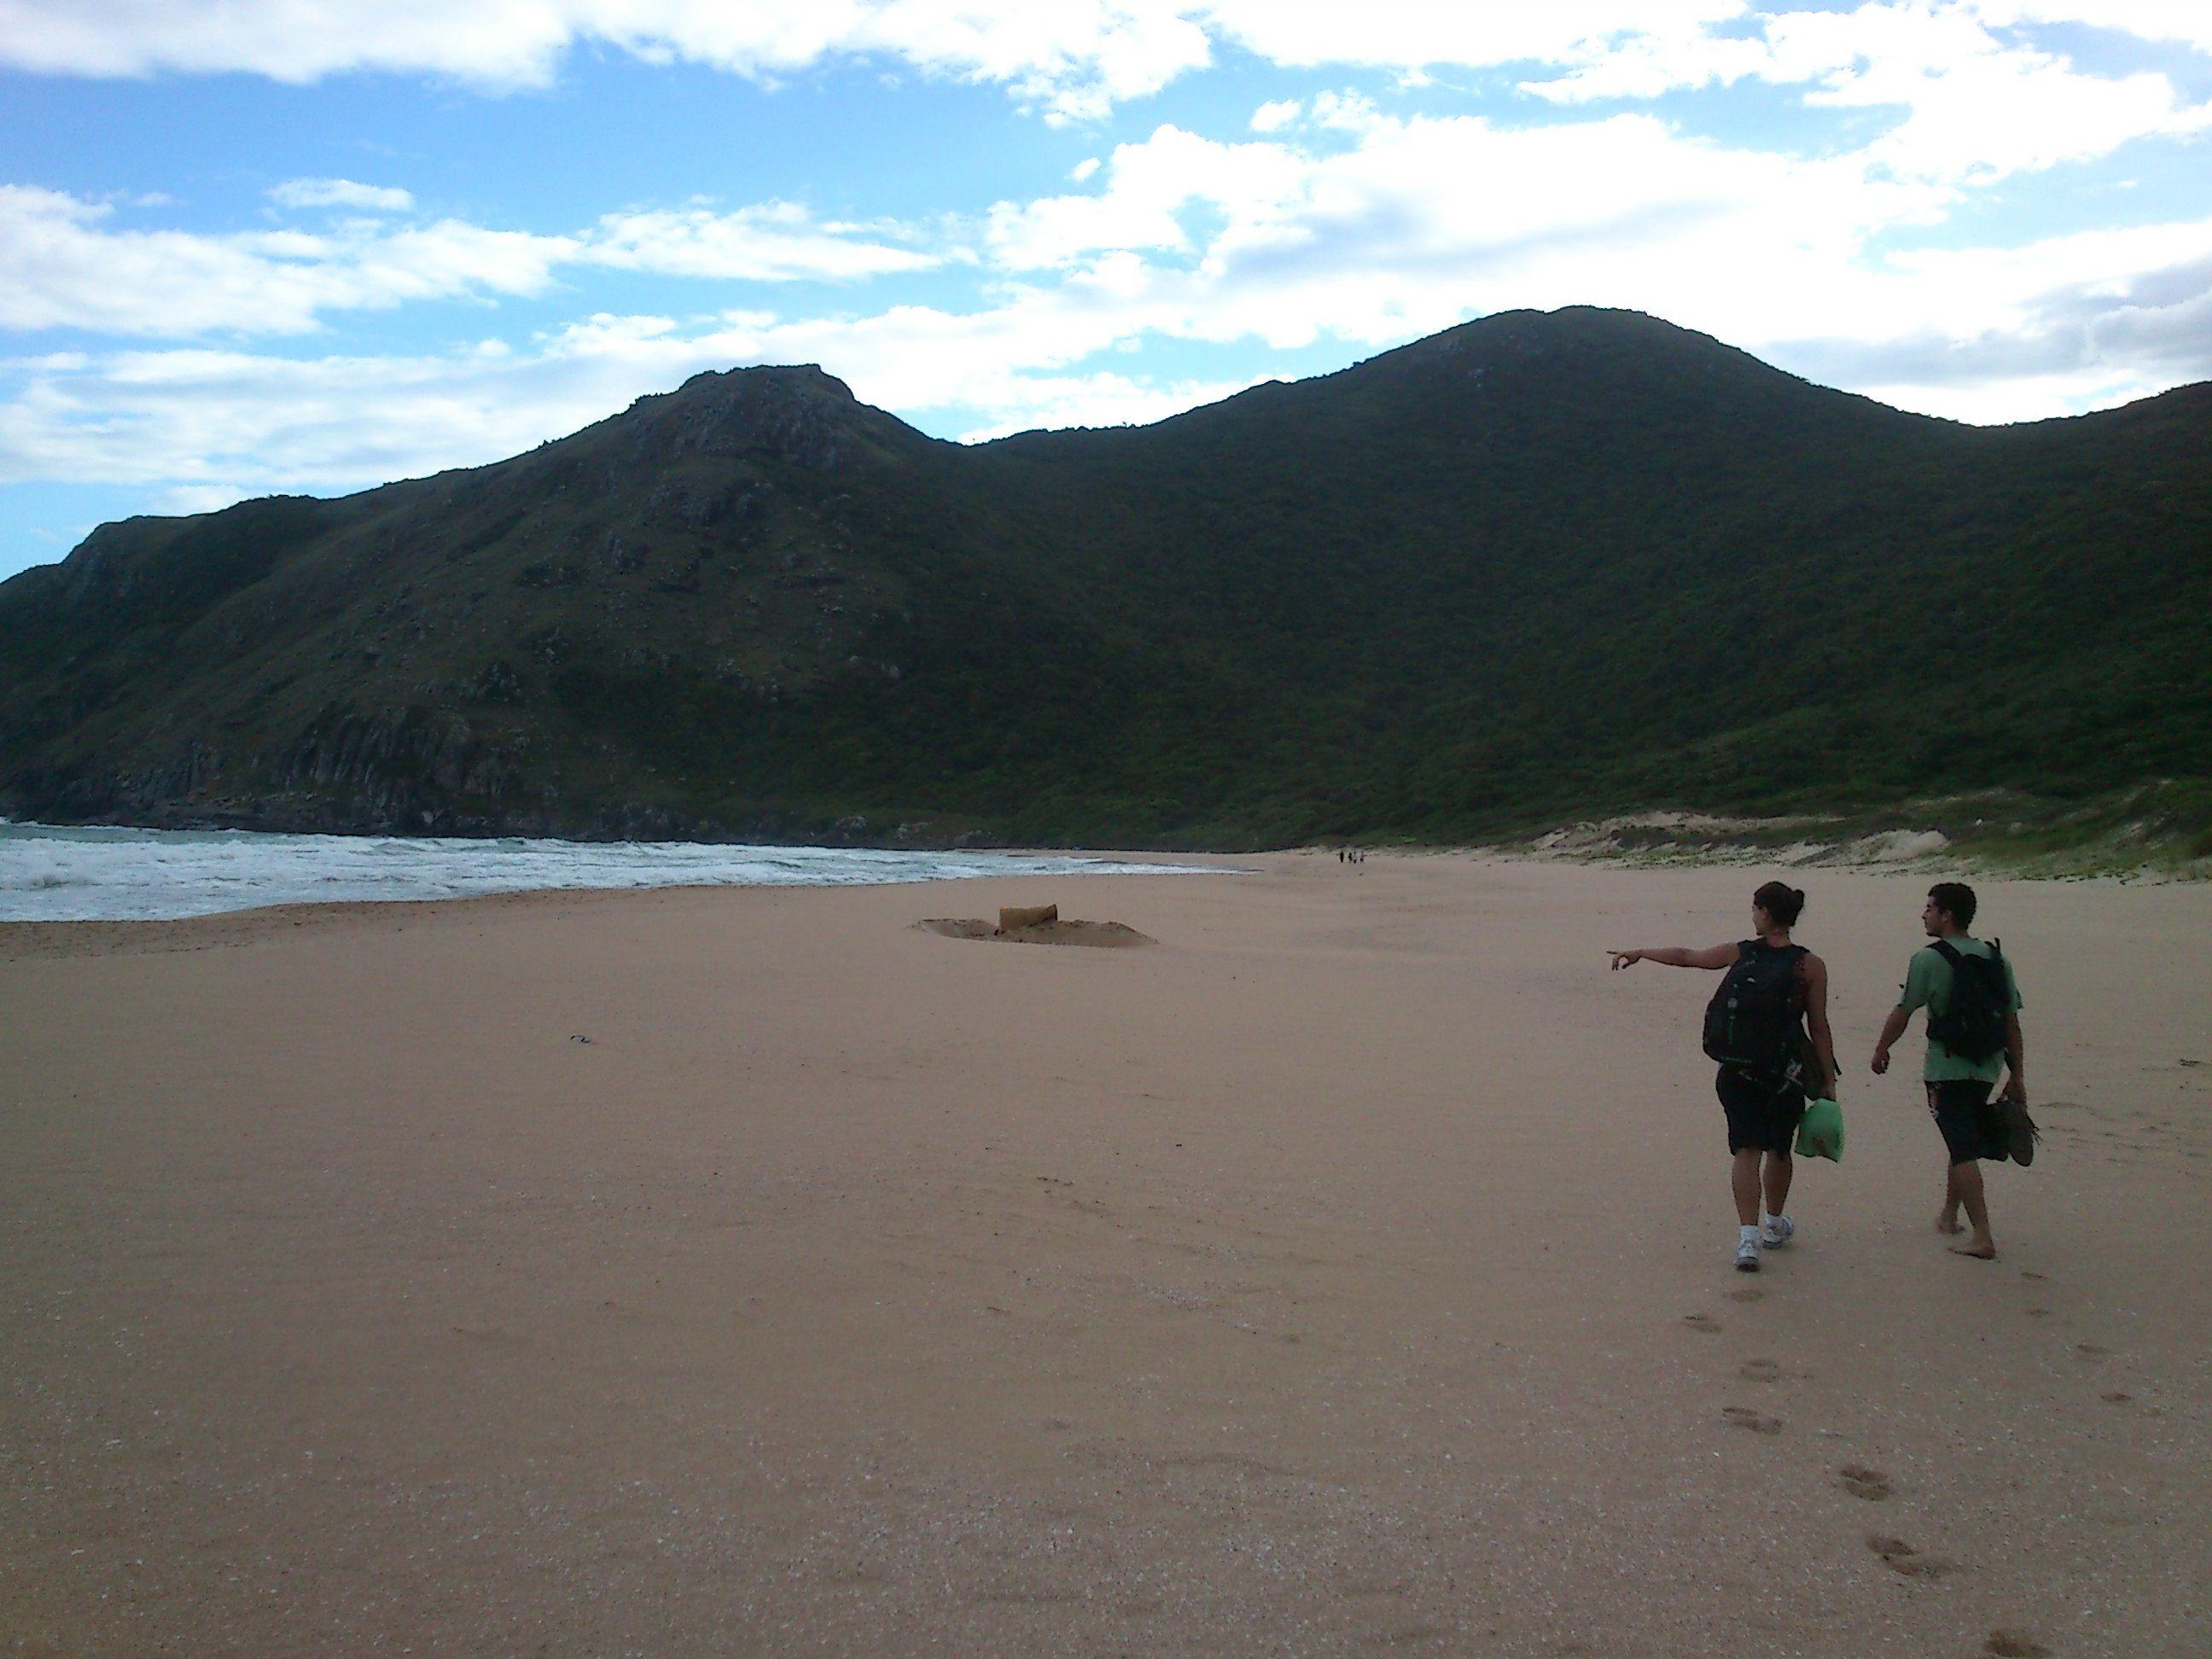 walking on the beach - Lagoinha do Leste, Florianópolis -SC.